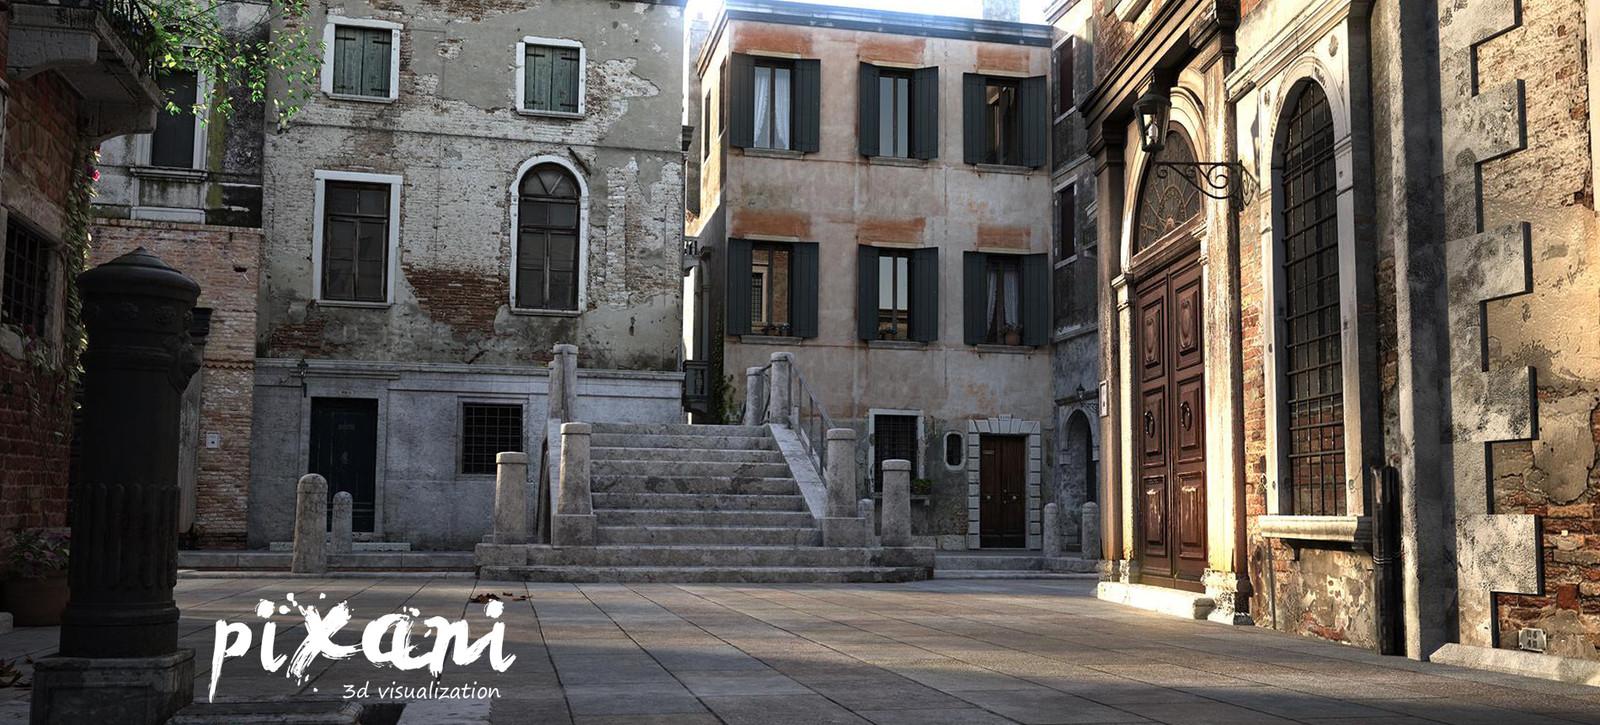 Venice streets  3D visualization  #3Dgörselleştirme #venice #streetview